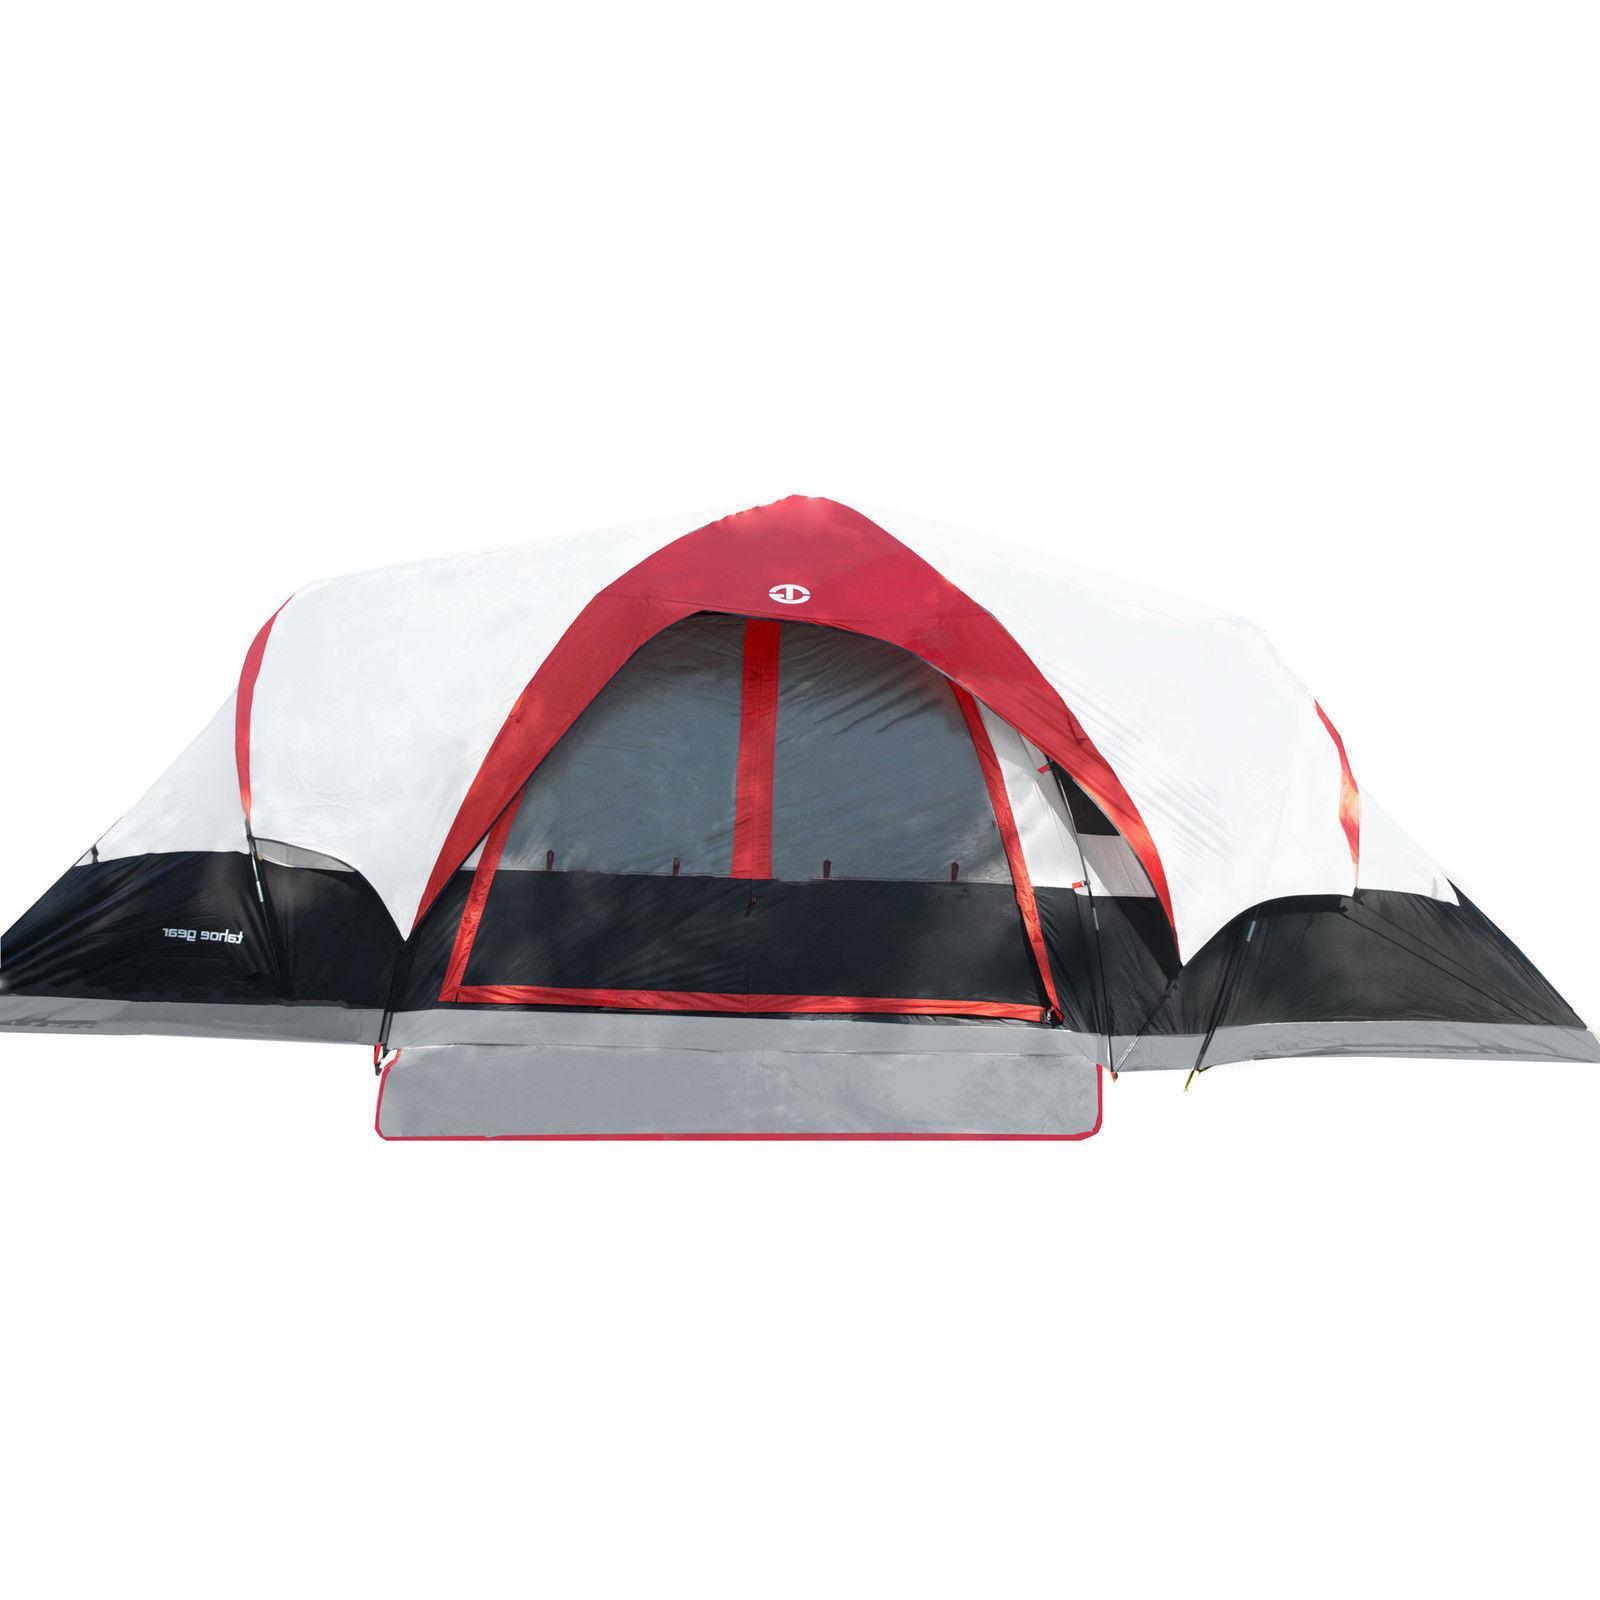 manitoba 14 person camping tent